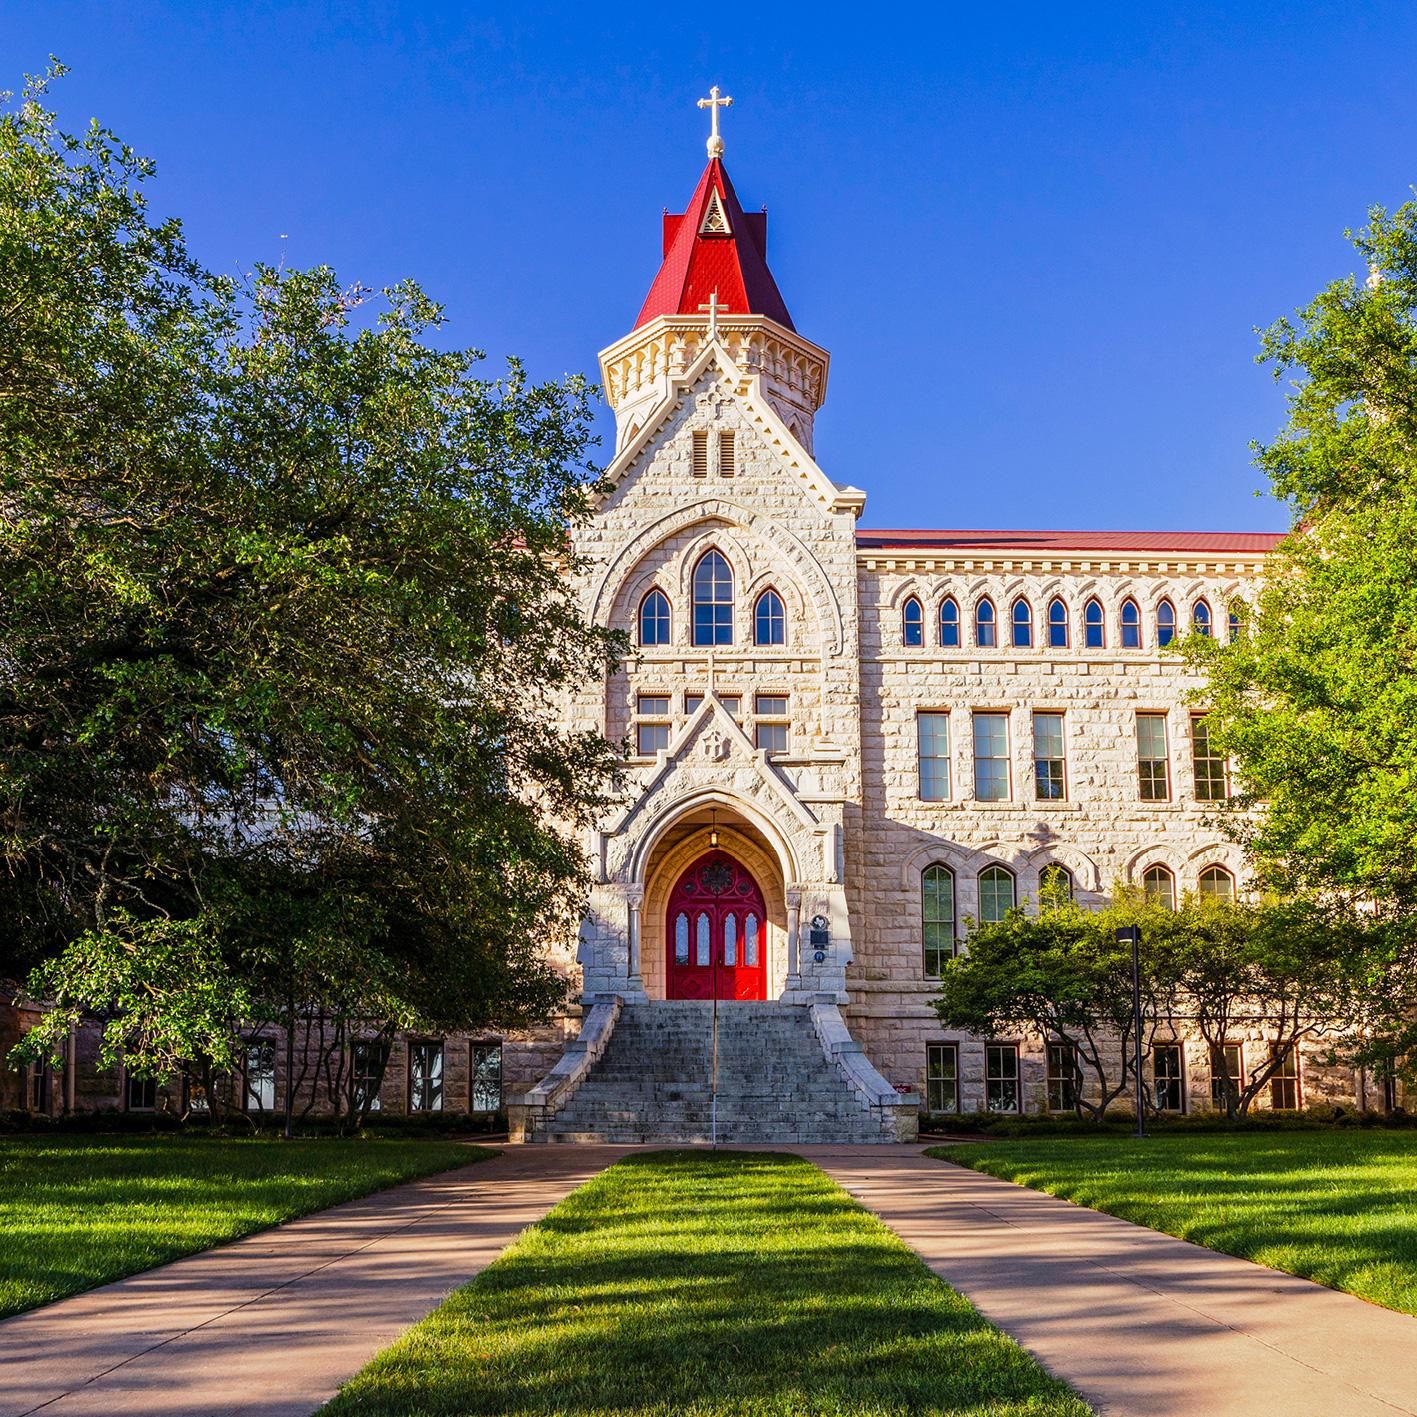 1999 Graduate St. Edward's University – Bachelor of Arts, Summa Cum Laude